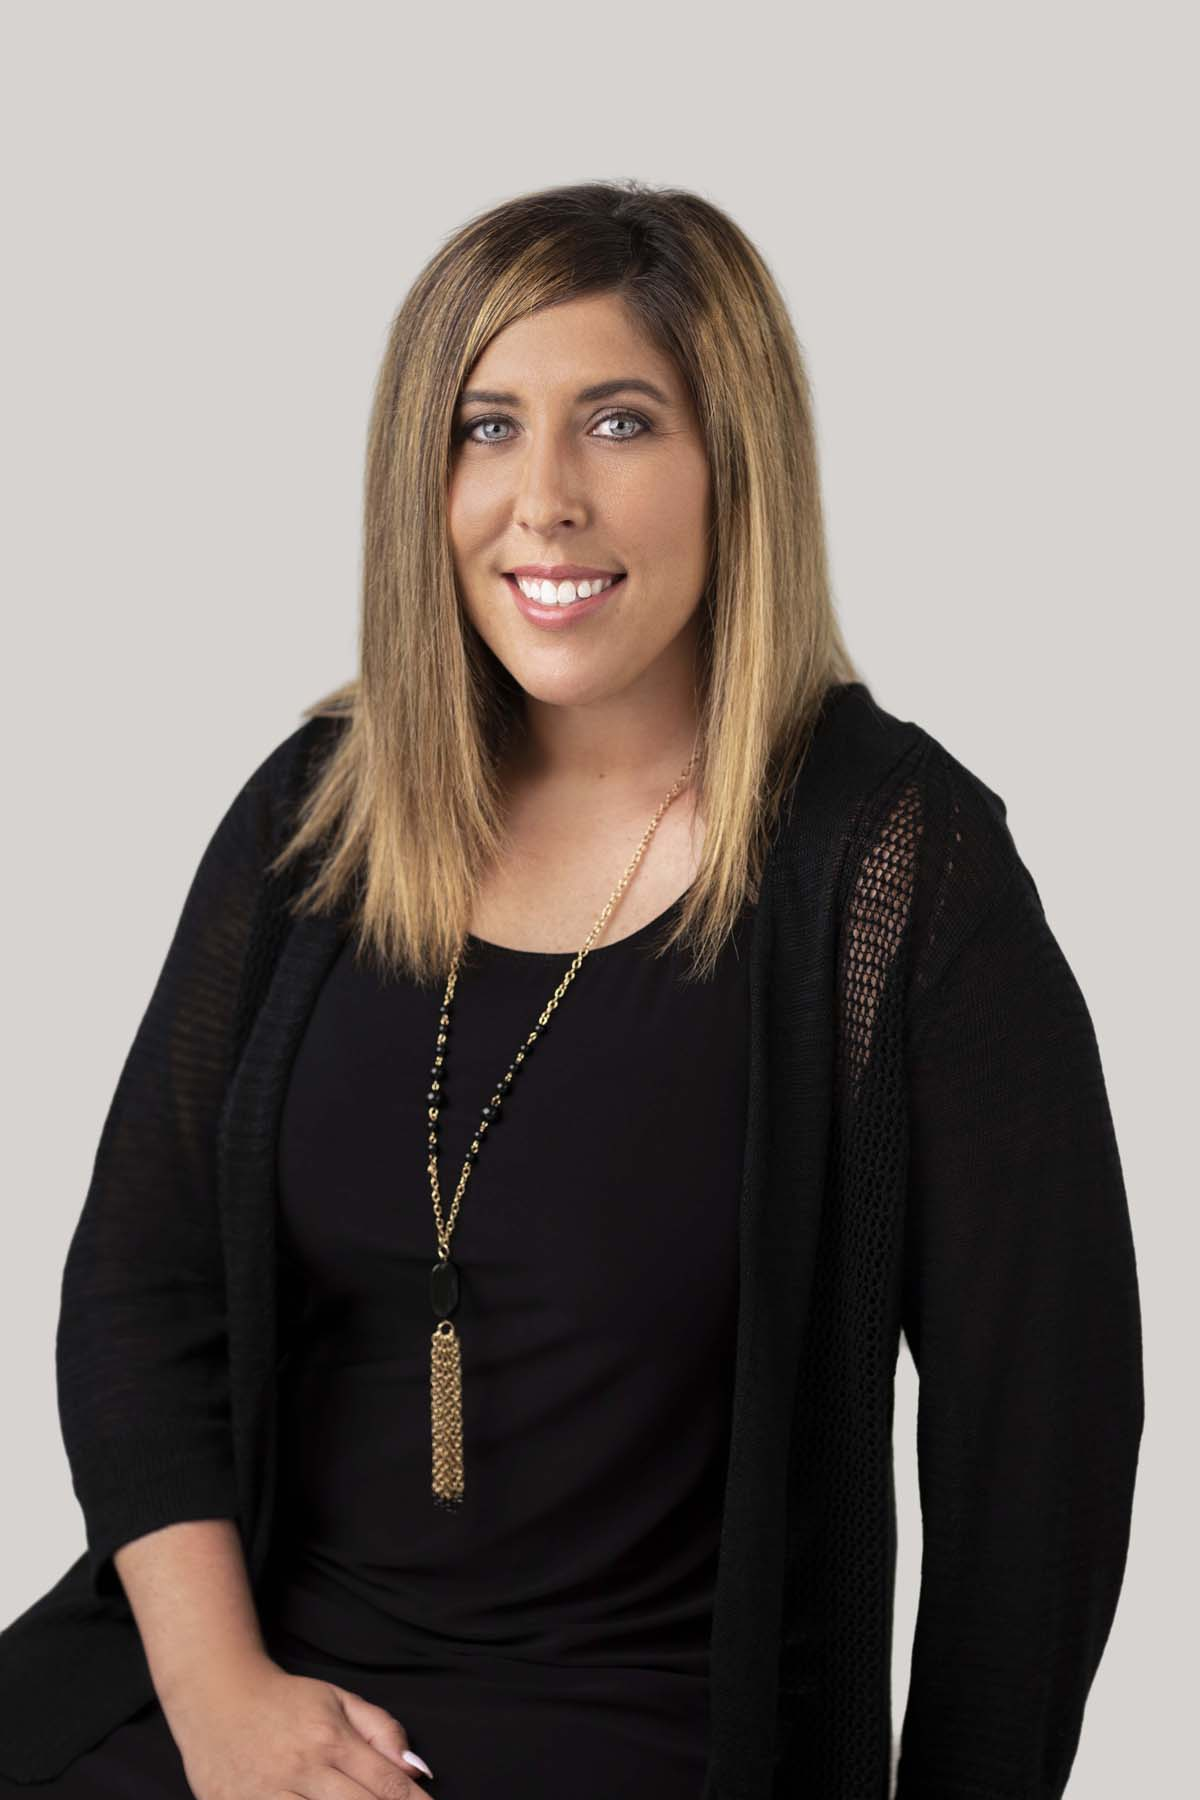 Chelsey Fitzcharles